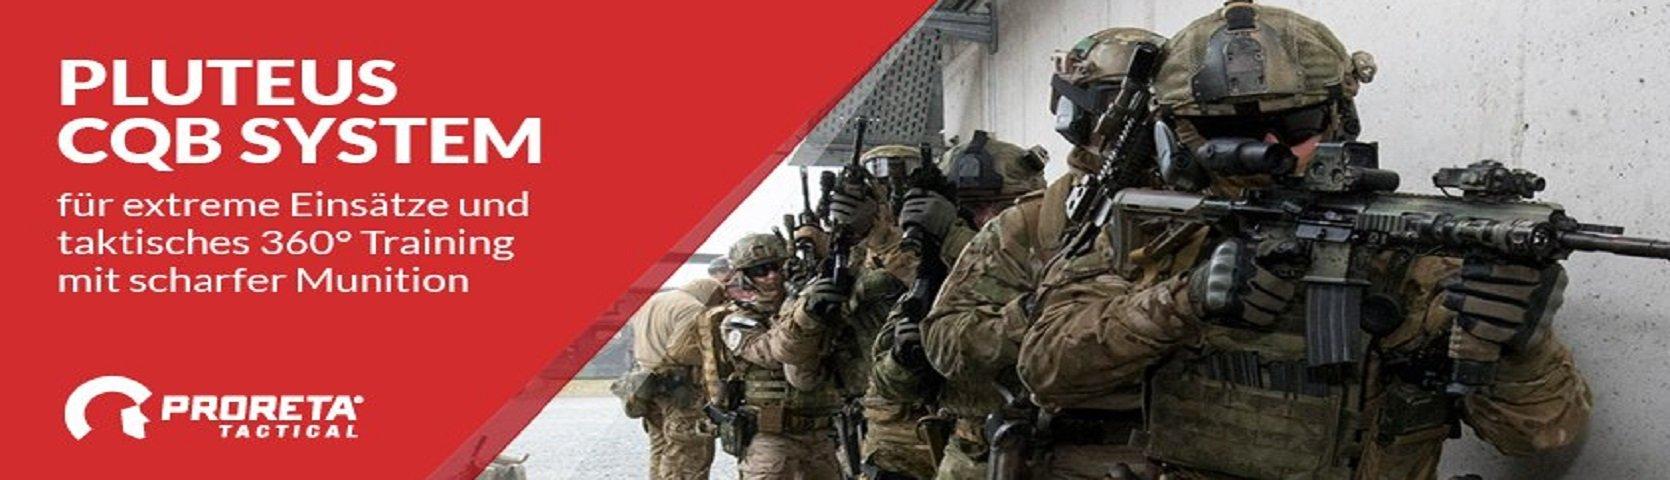 PRORETA Tactical GmbH